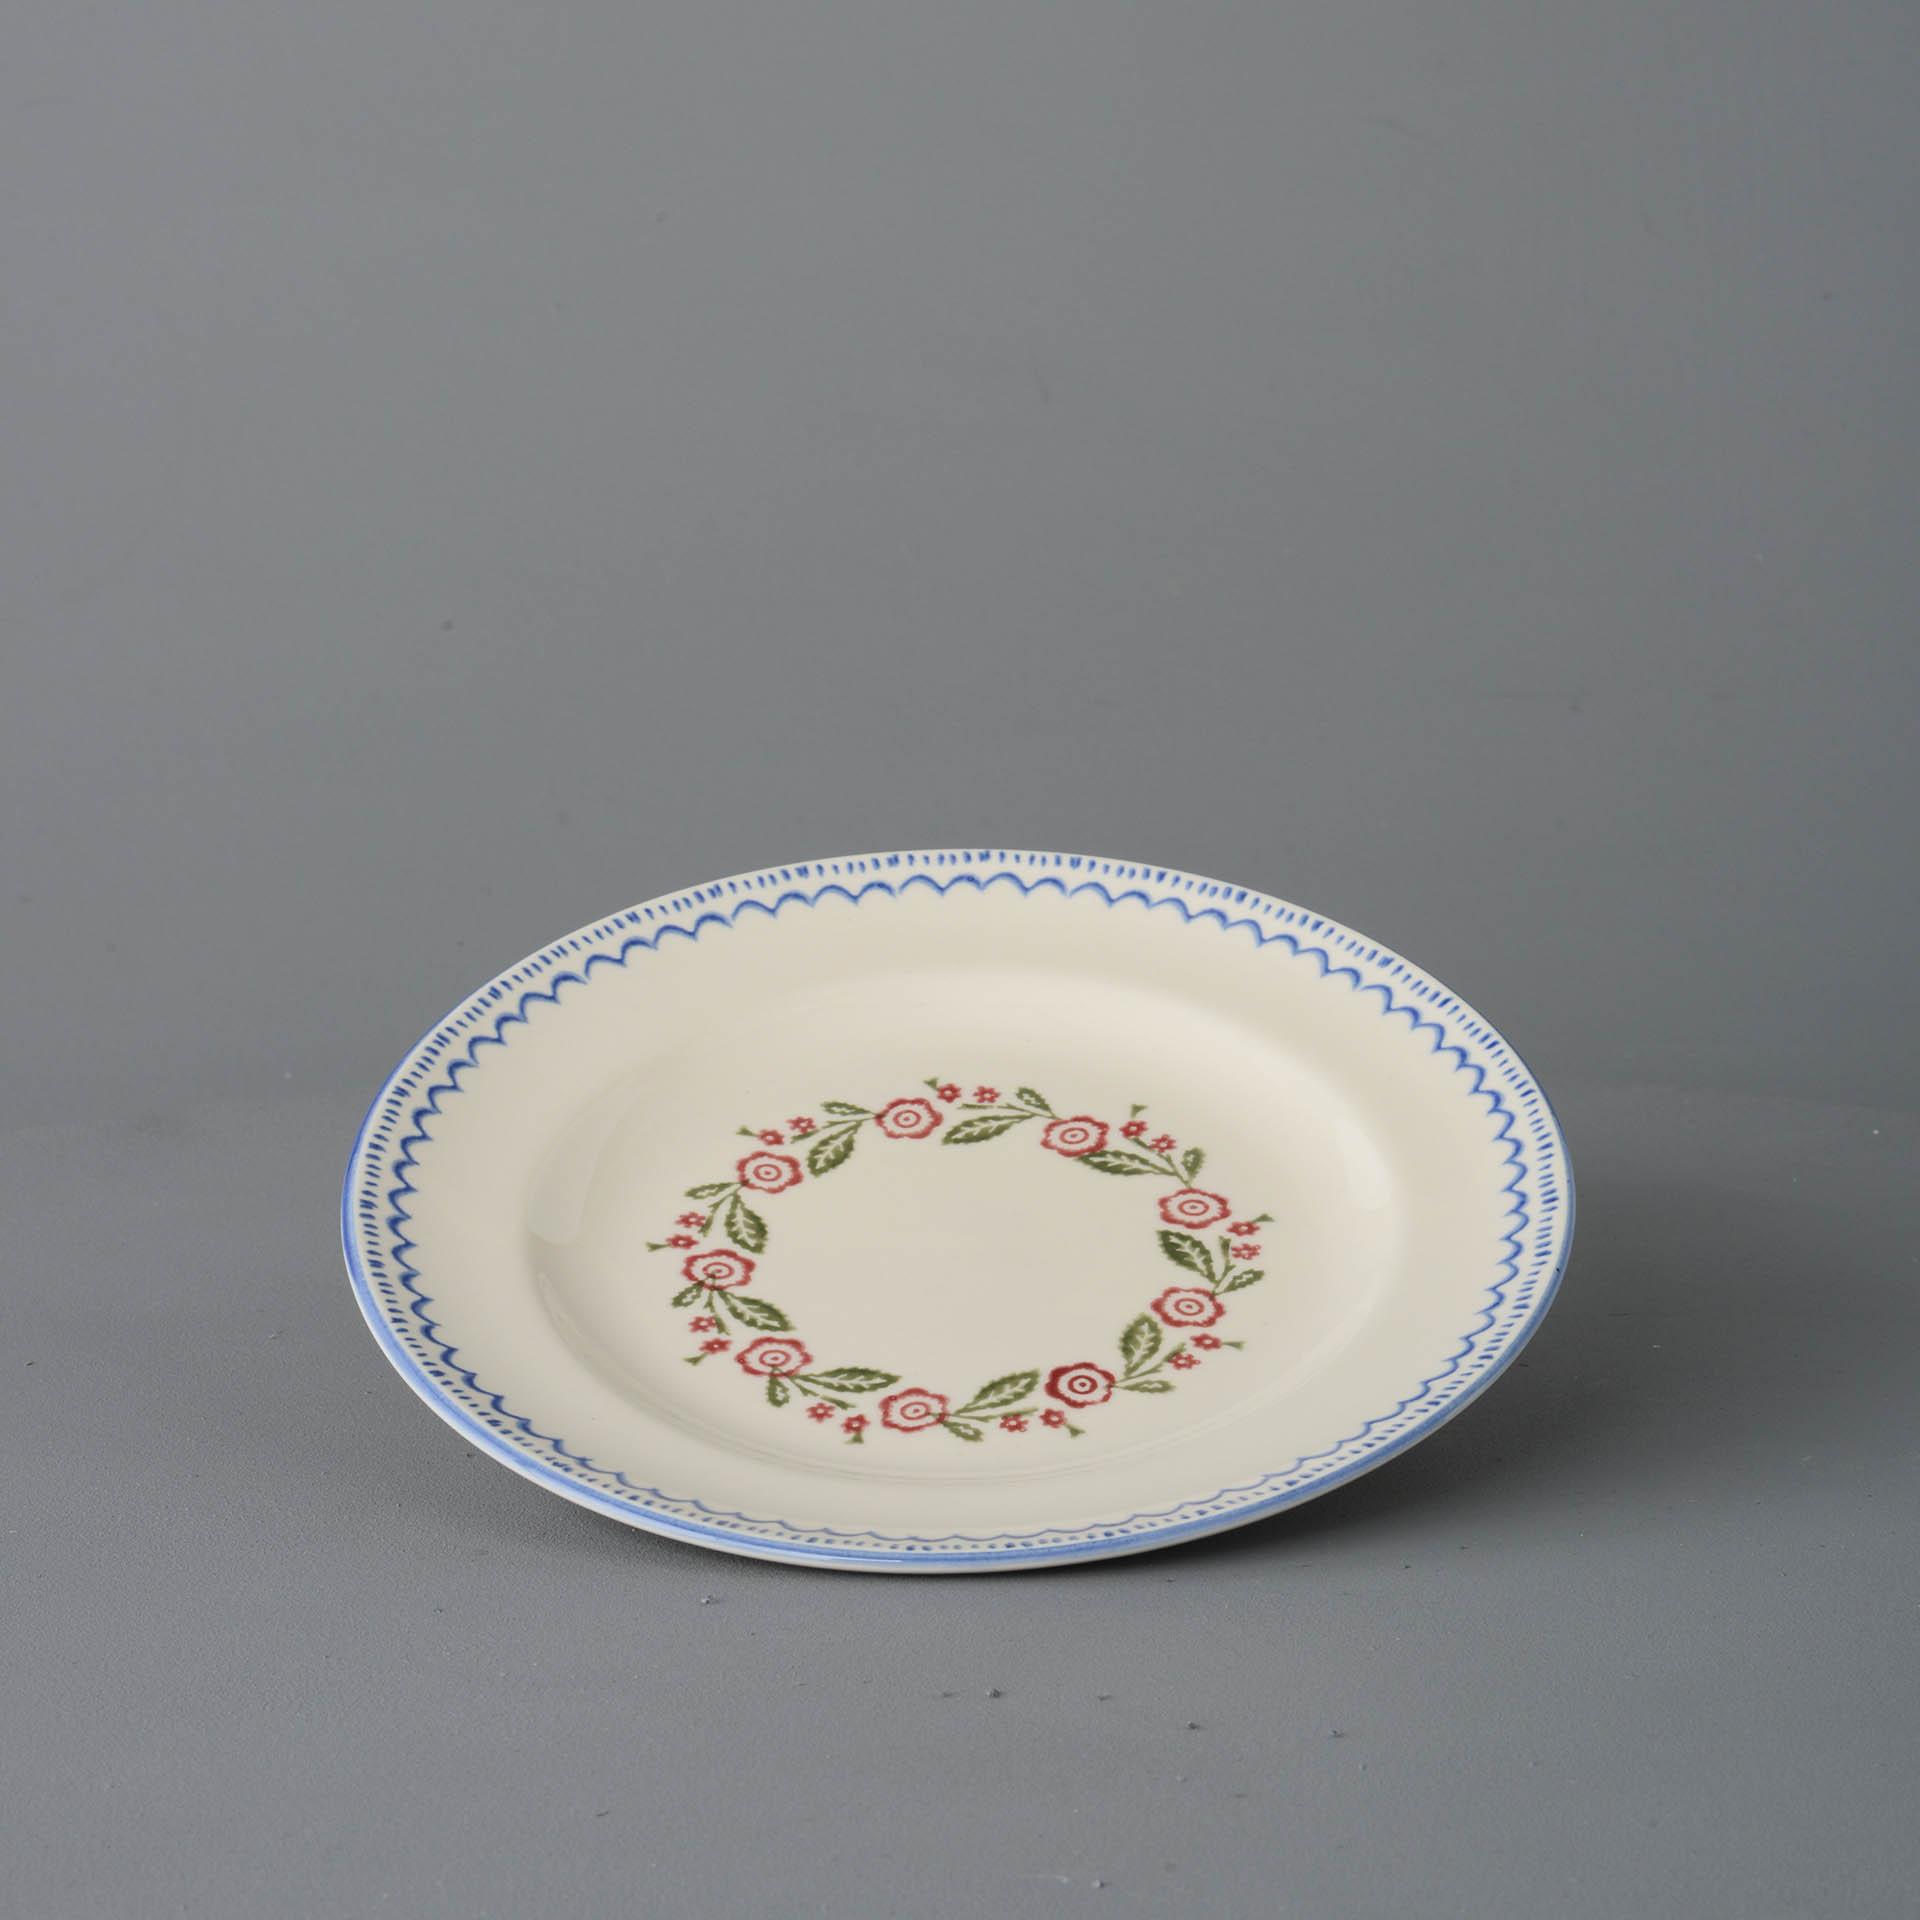 Creeping Briar Dessert plate